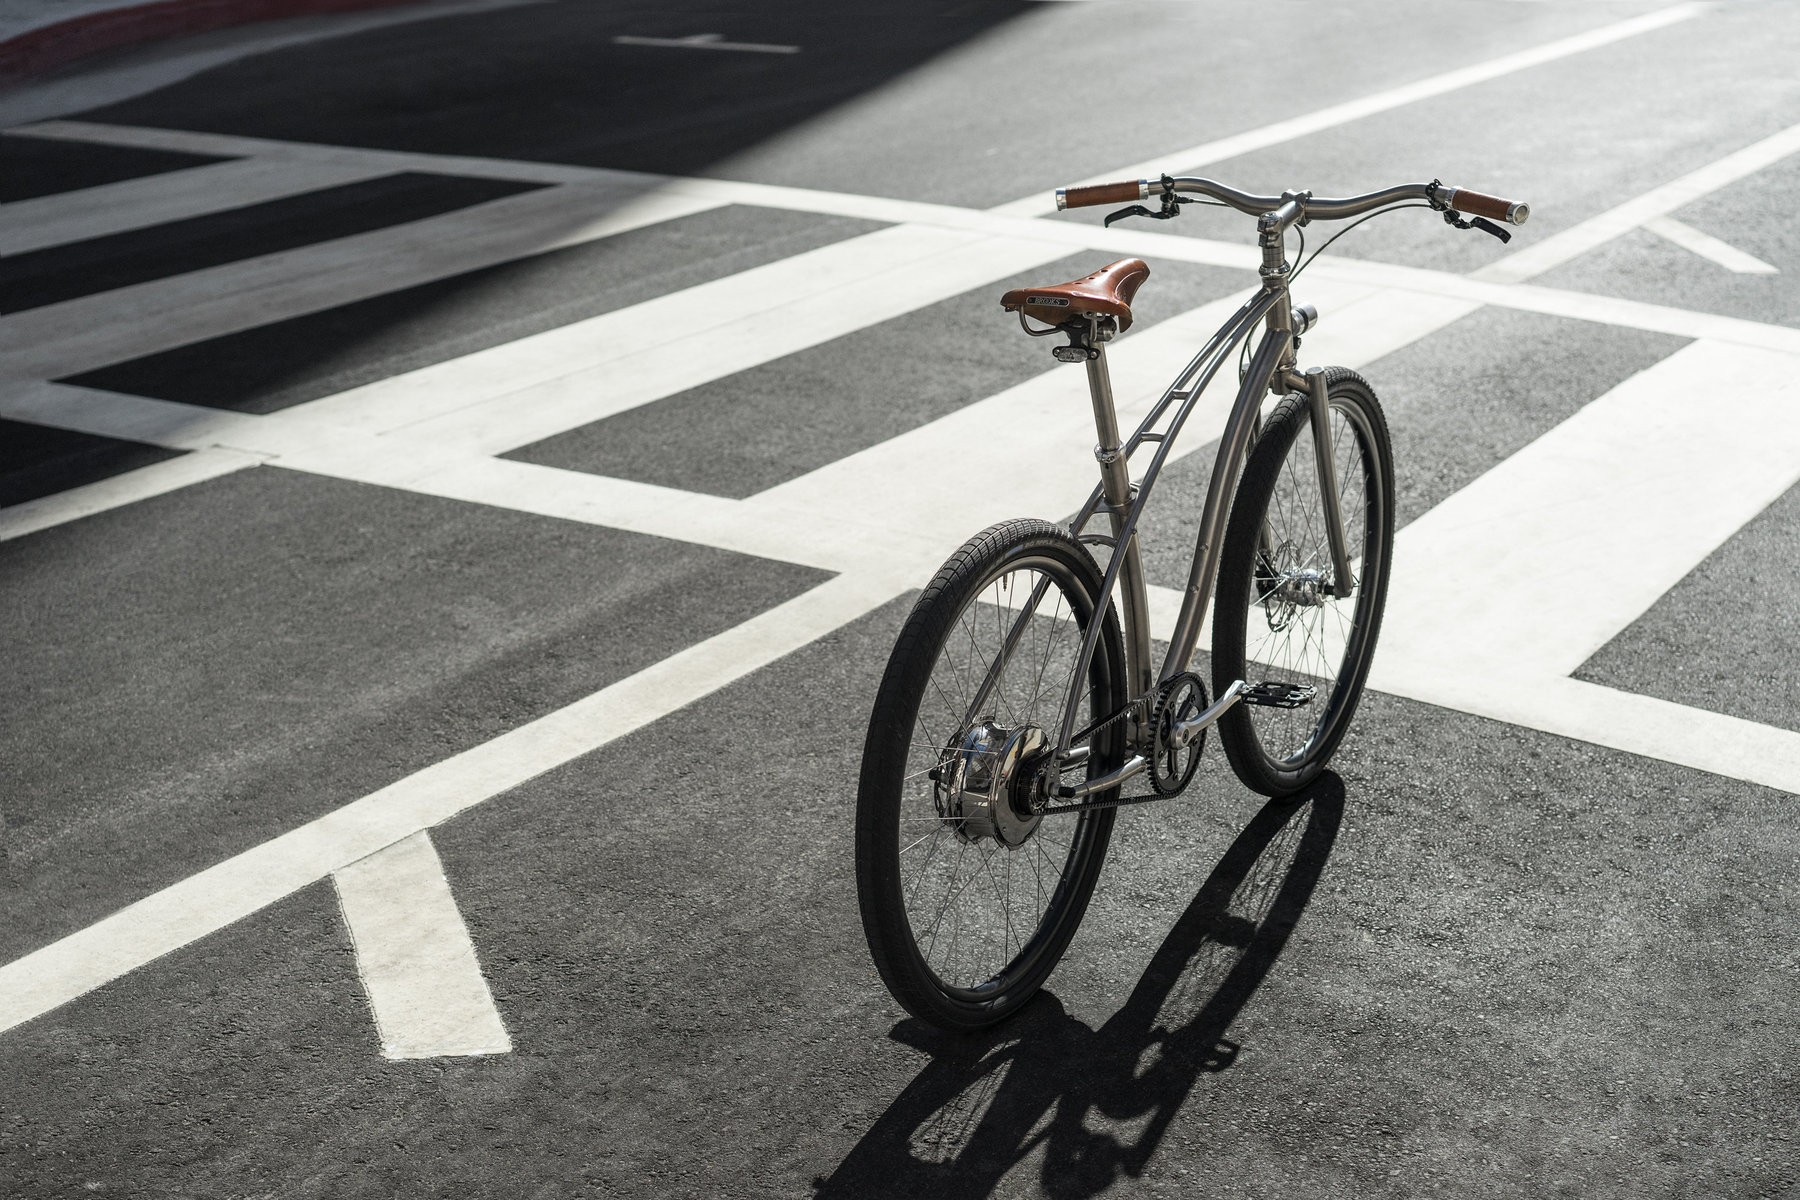 nwm-budnitz-bicycle-vae-ebike-titanium-brooks-urban-urbain-city-titane-velo